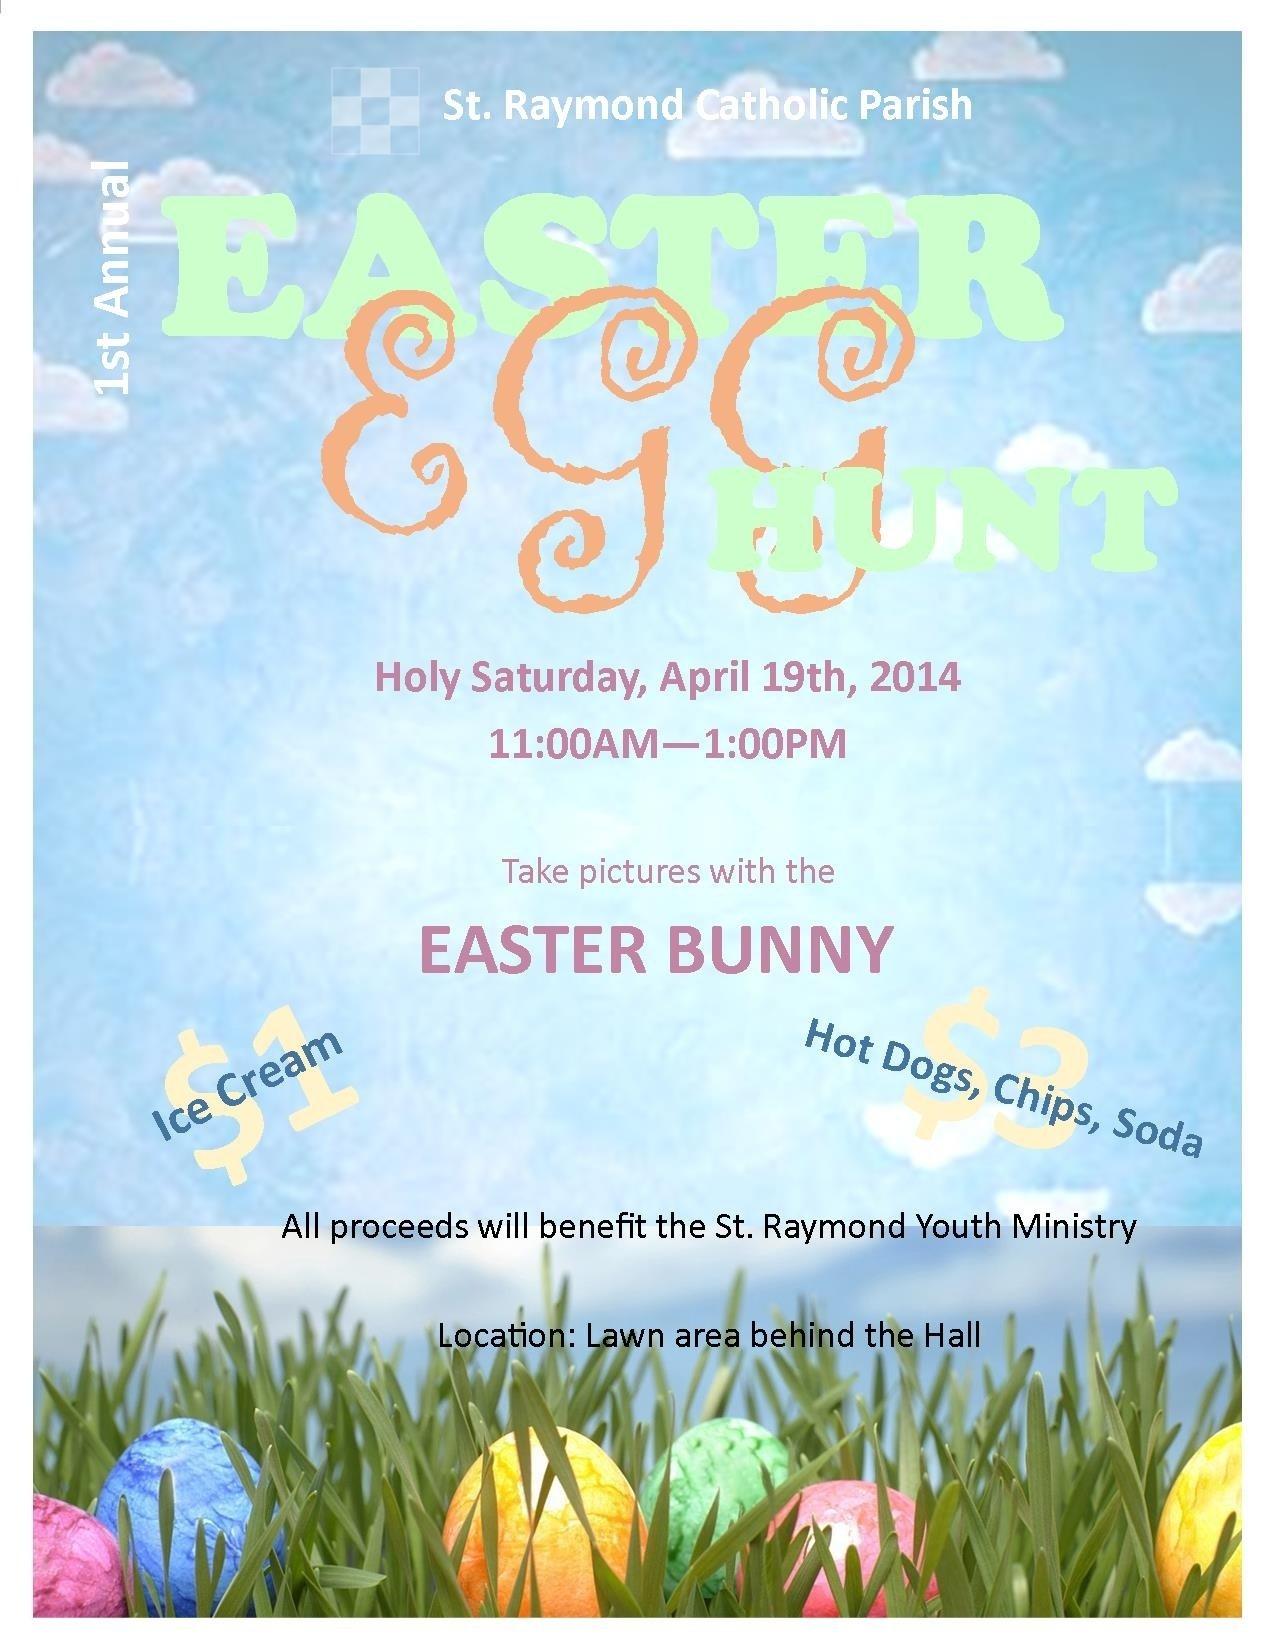 10 Beautiful Church Easter Egg Hunt Ideas st raymond catholic church free easter egg hunt apr 19 2014 2020